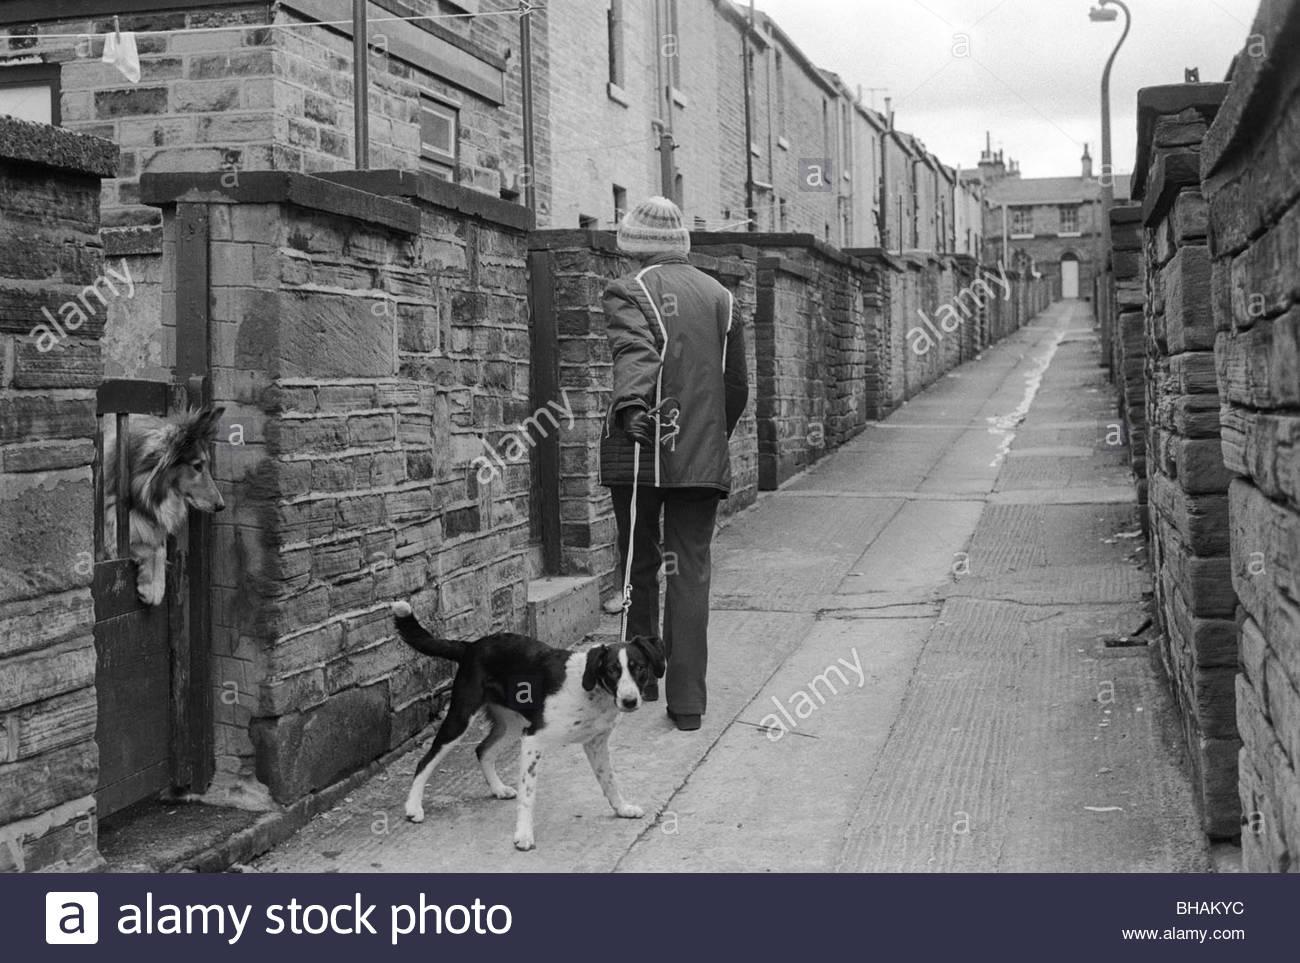 Saltaire near Bradford West Yorkshire England 1981. HOMER SYKES - Stock Image